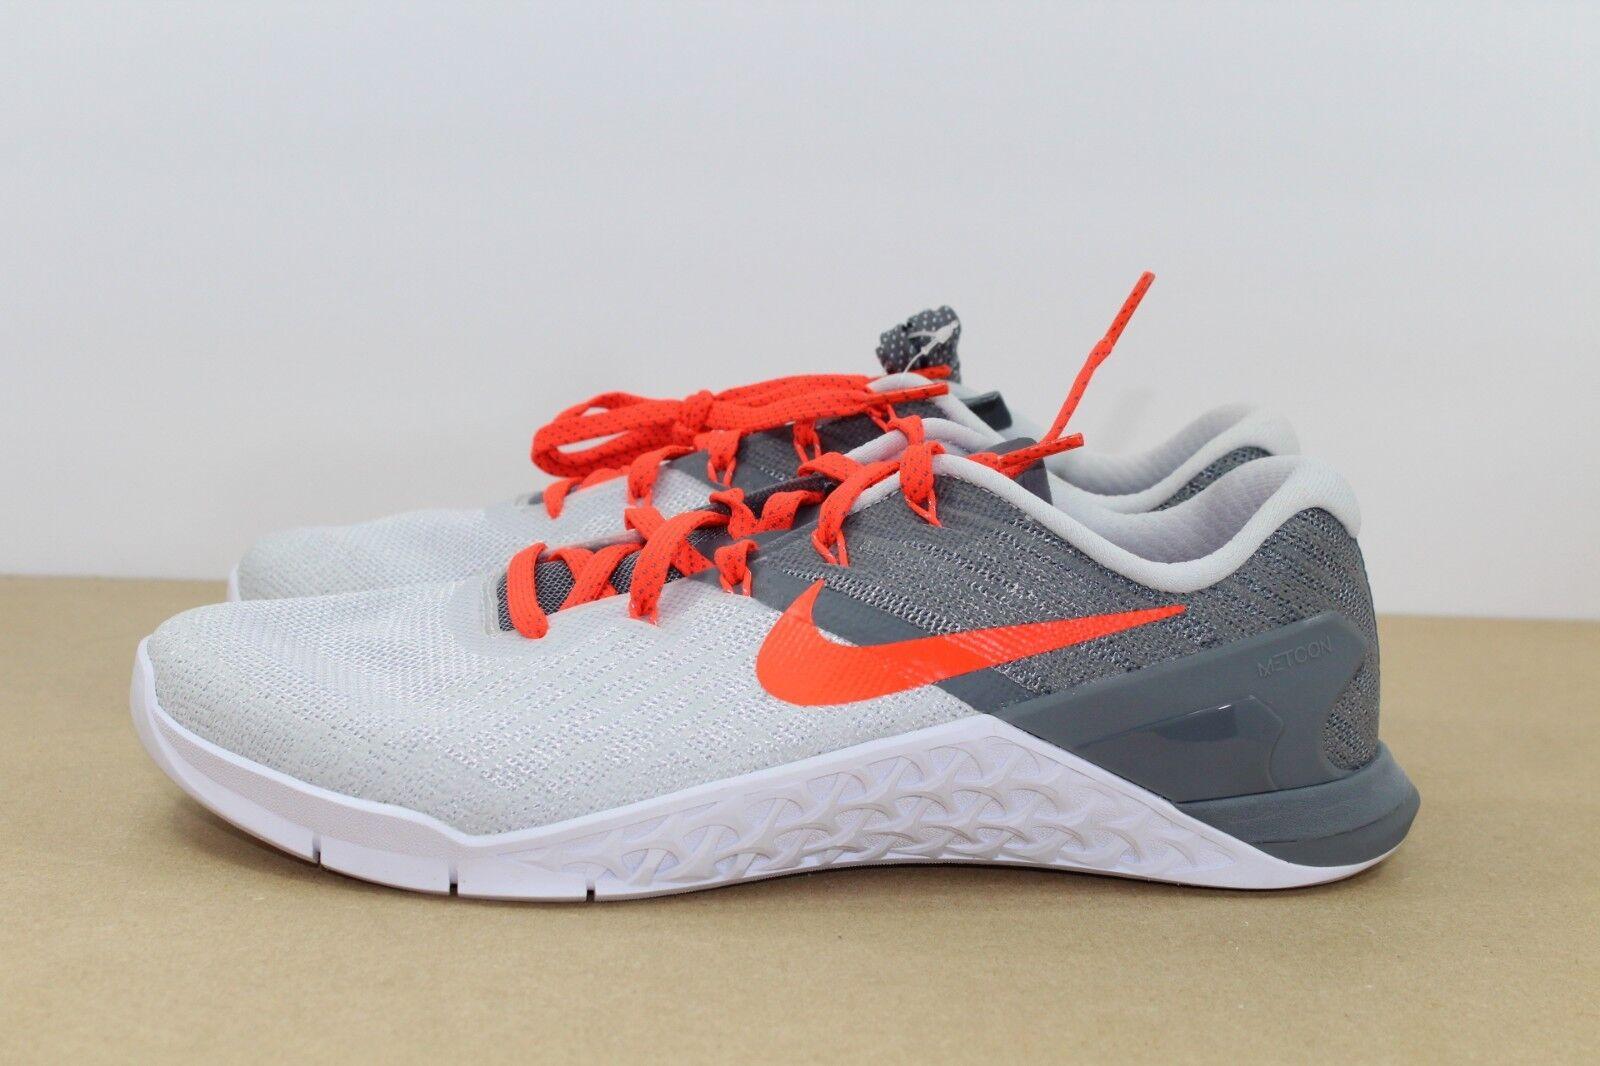 Nike Metcon 3 Running training shoes Platinum Crimson 849807-006 Size 9.5